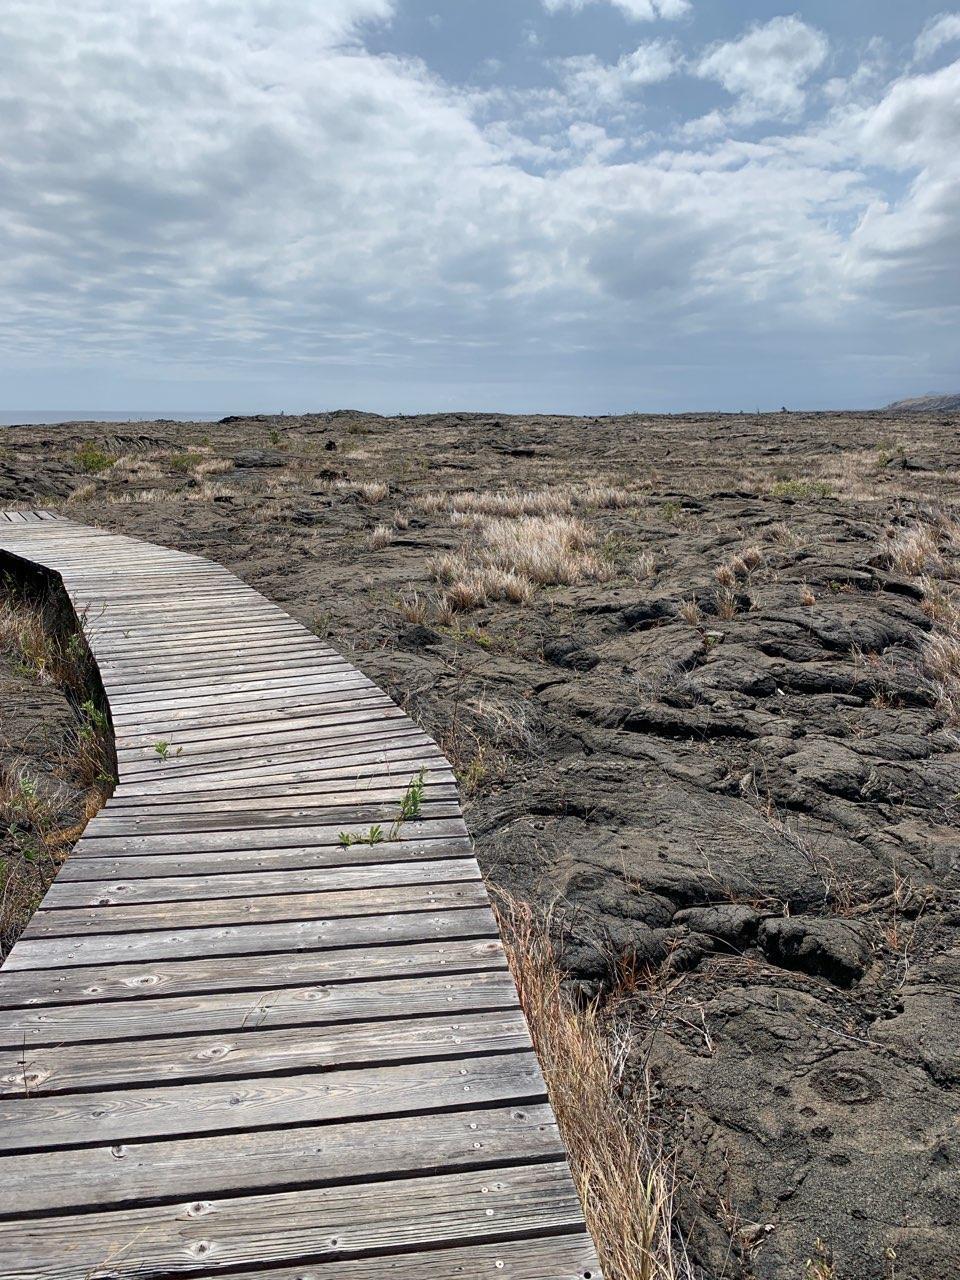 Vacation Rental - Hawaii Volcanoes National Park - Petroglyph Field